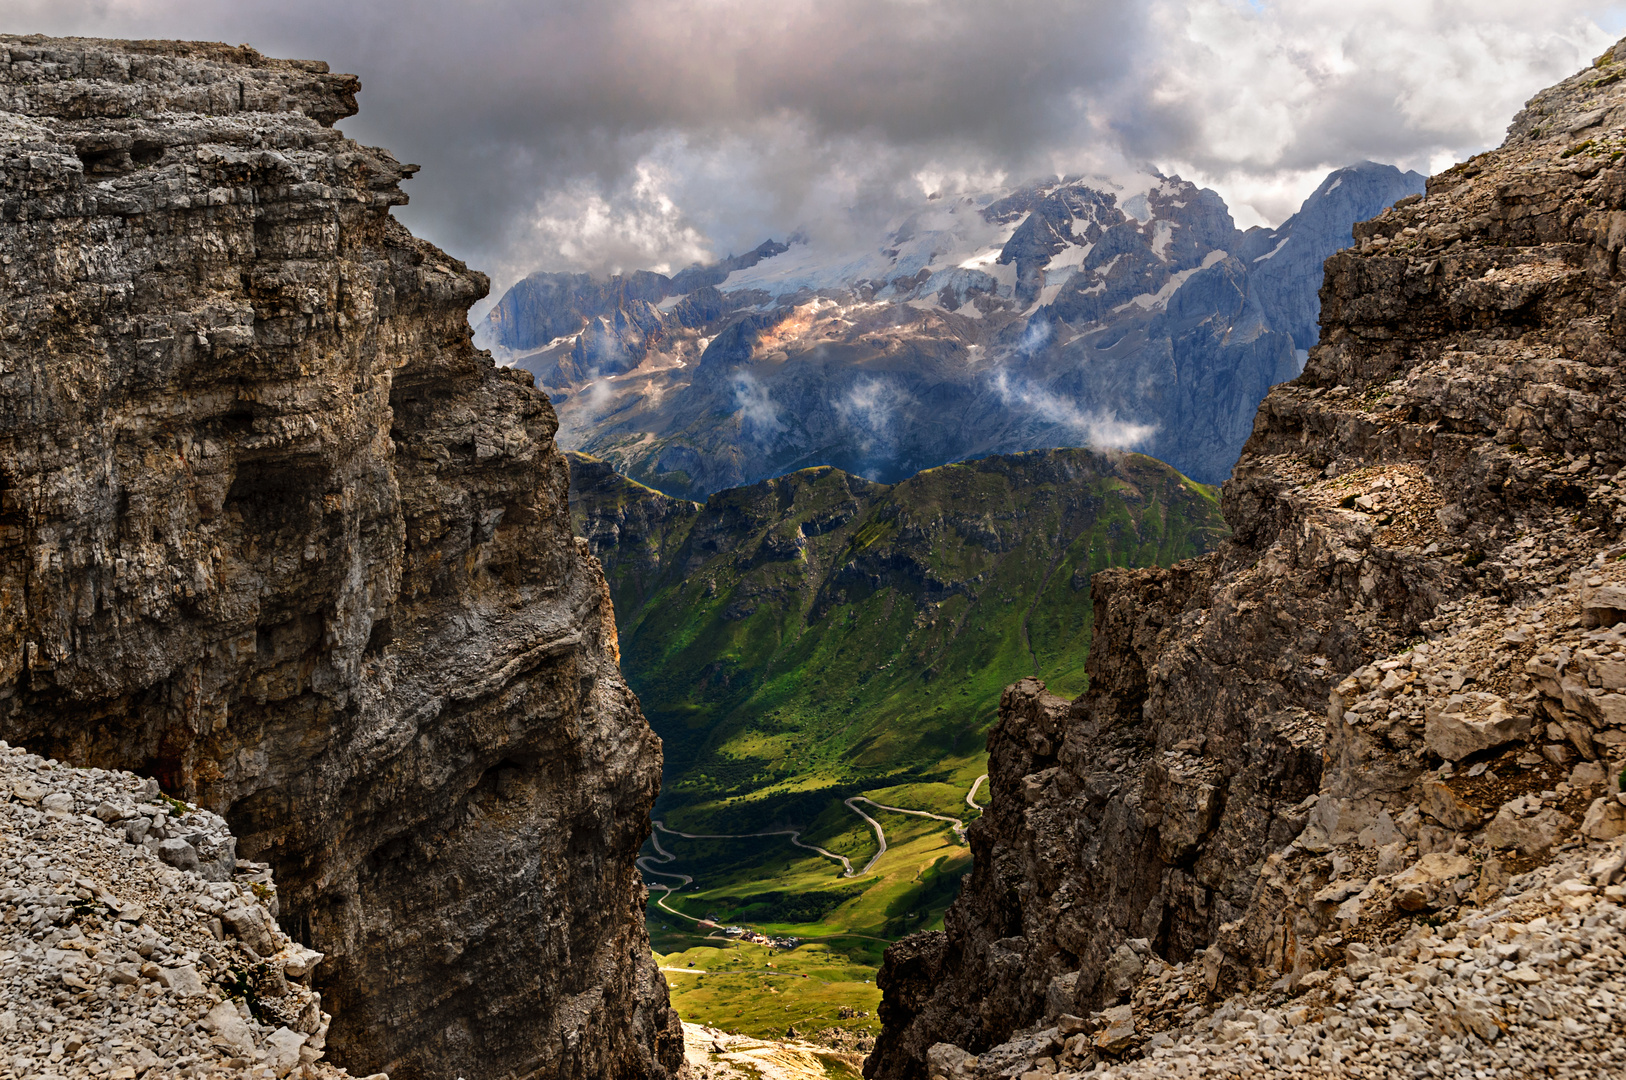 Vista tra le rocce